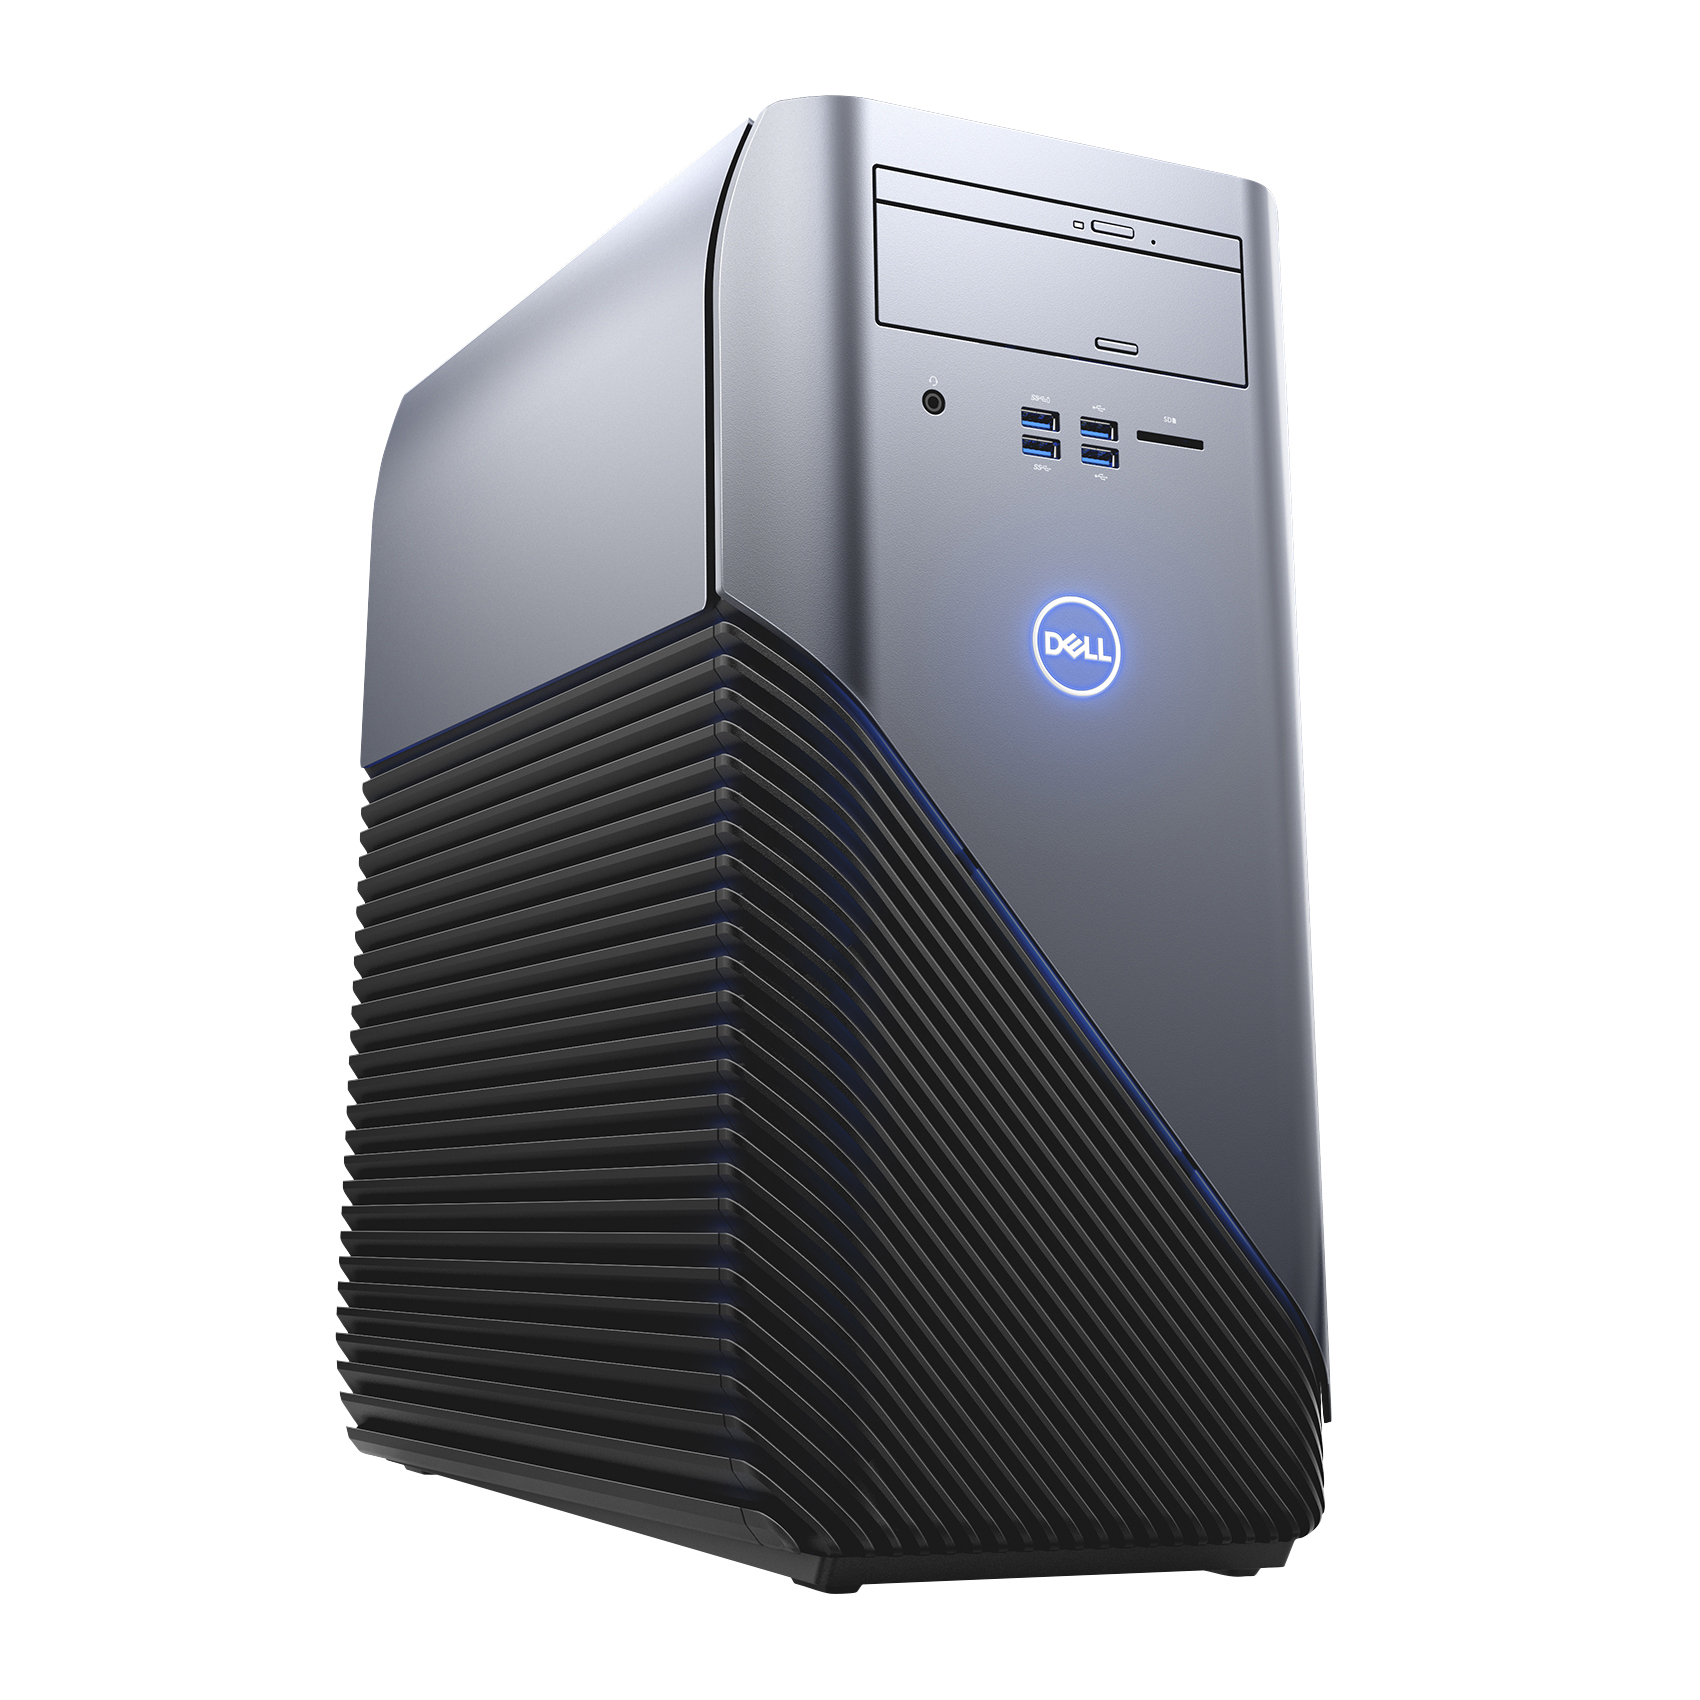 Dell™ Inspiron Desktop PC, AMD Ryzen™ 5, 8GB Memory, 1TB Hard Drive, RX 570 4GB, Windows® 10 Home, Demo, Radeon RX 570